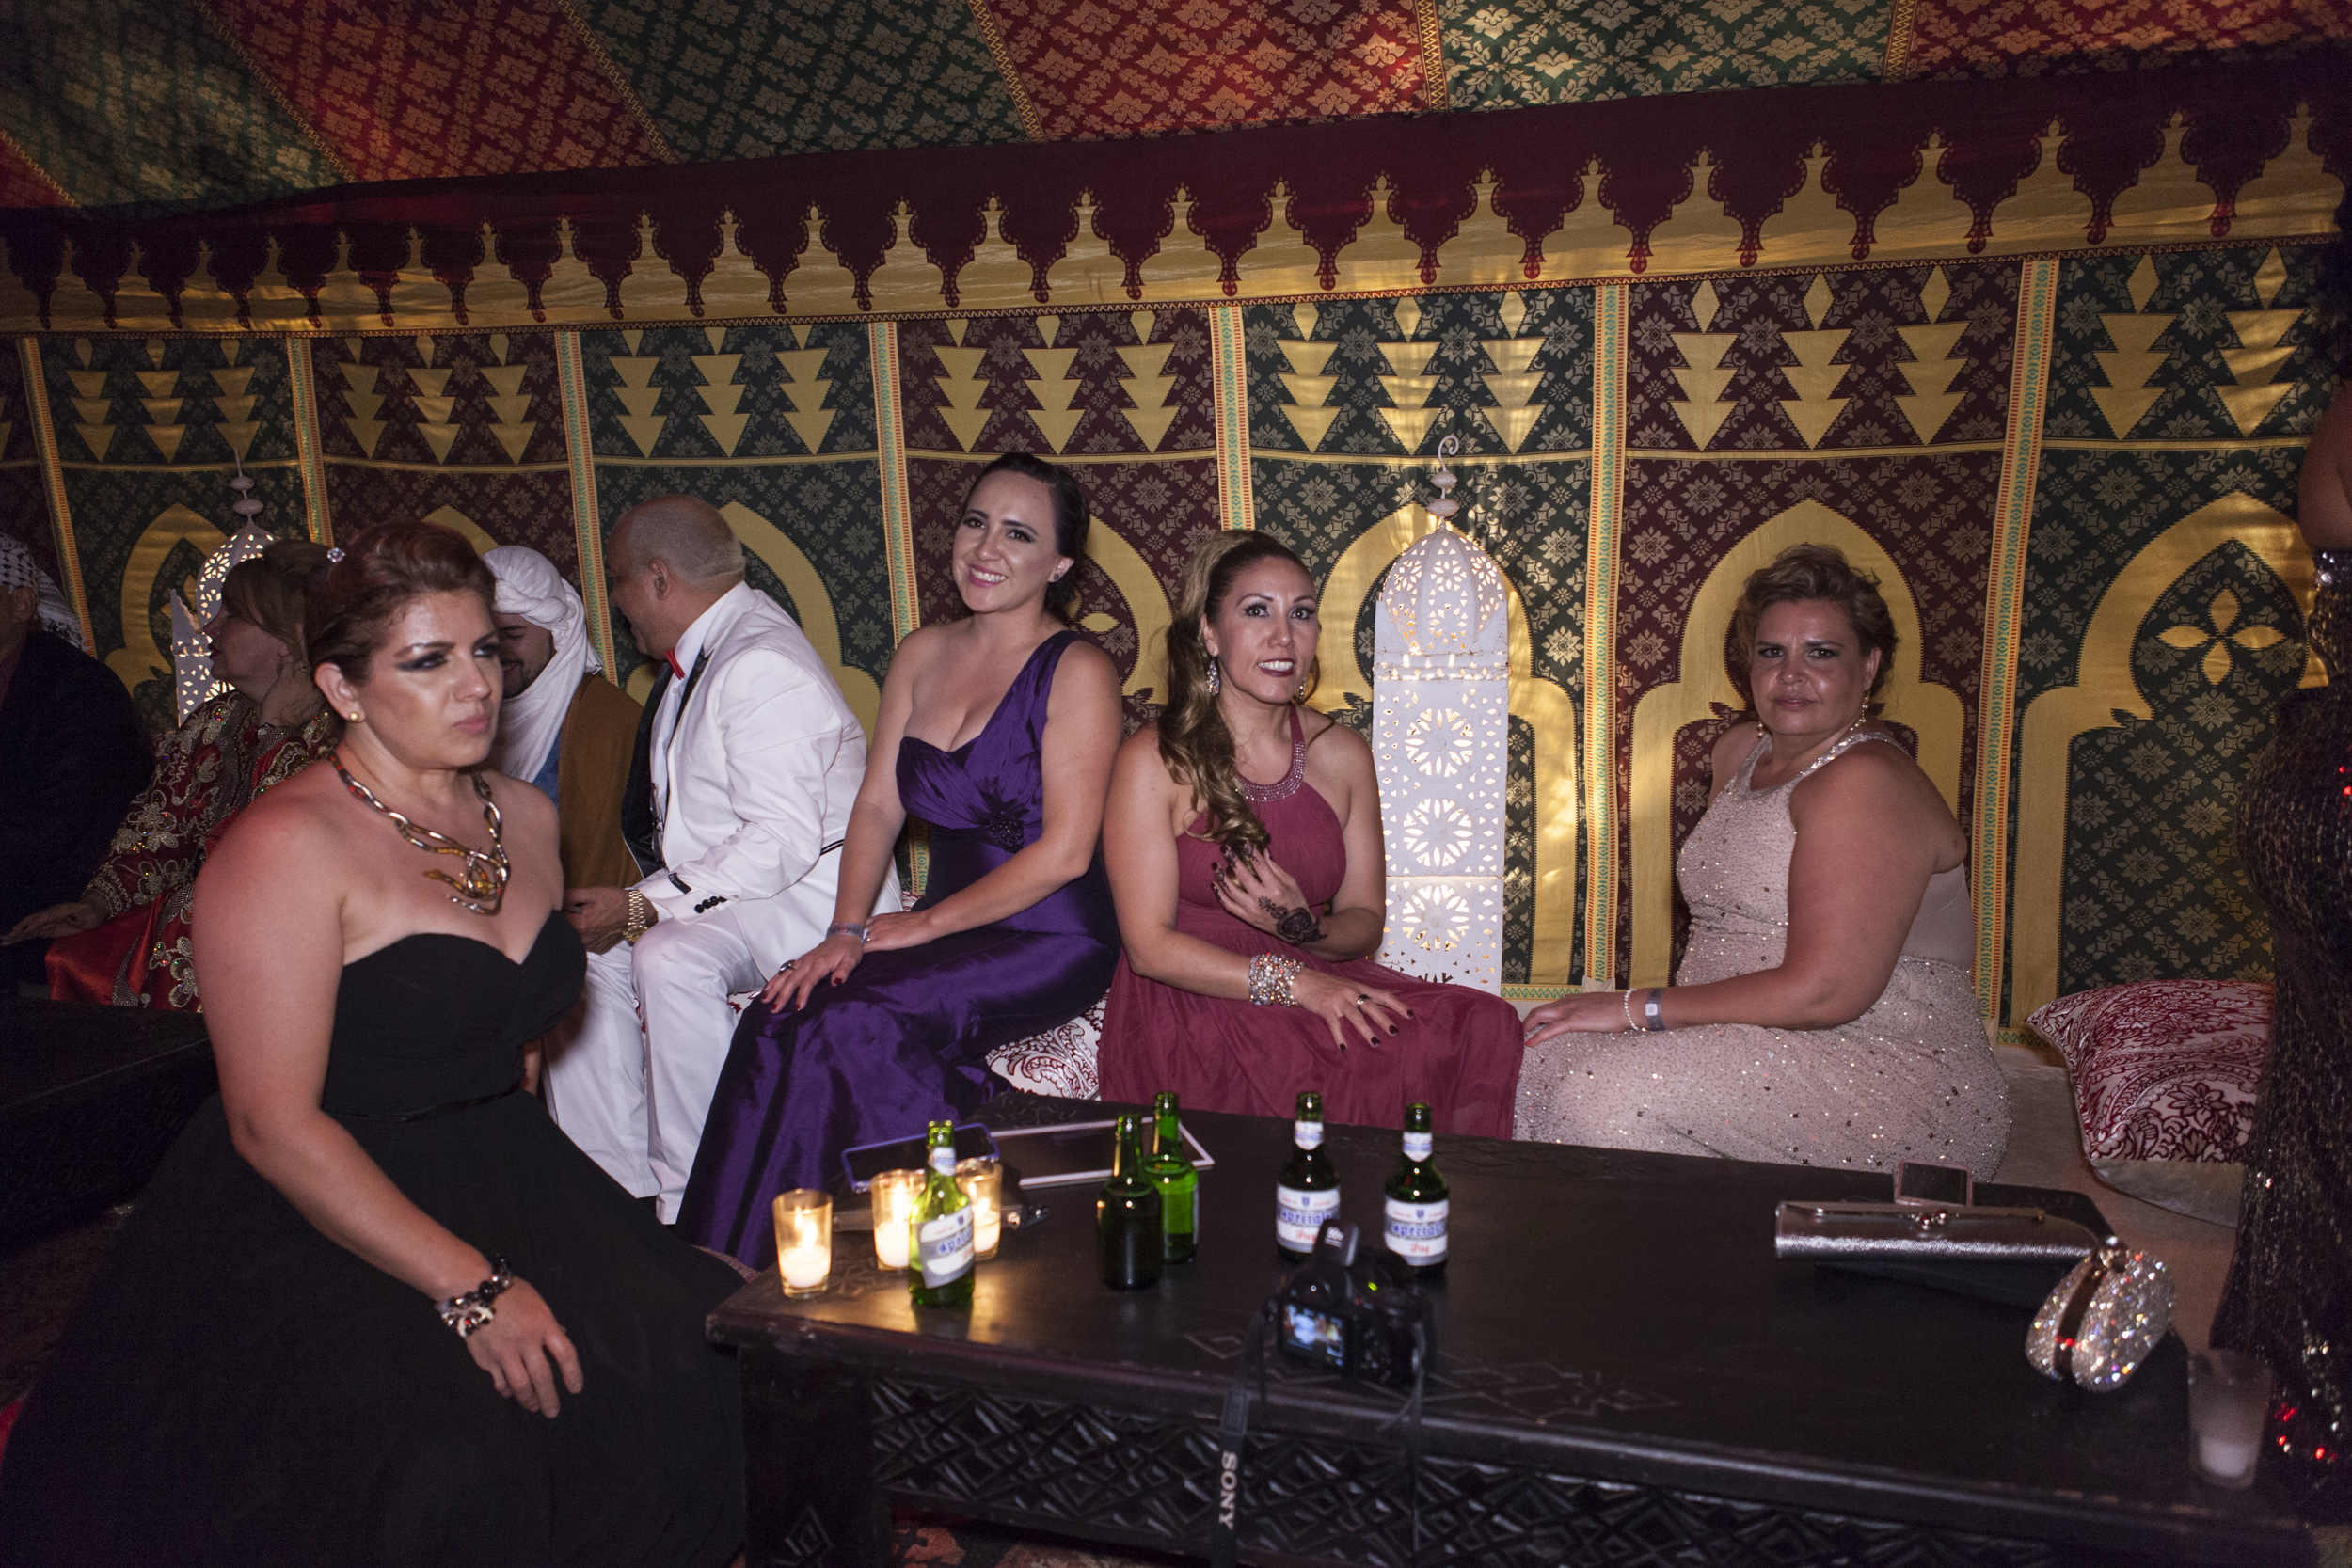 marrakech_cena_gala_convencion_anual_salerm_cosmetics_proline_131